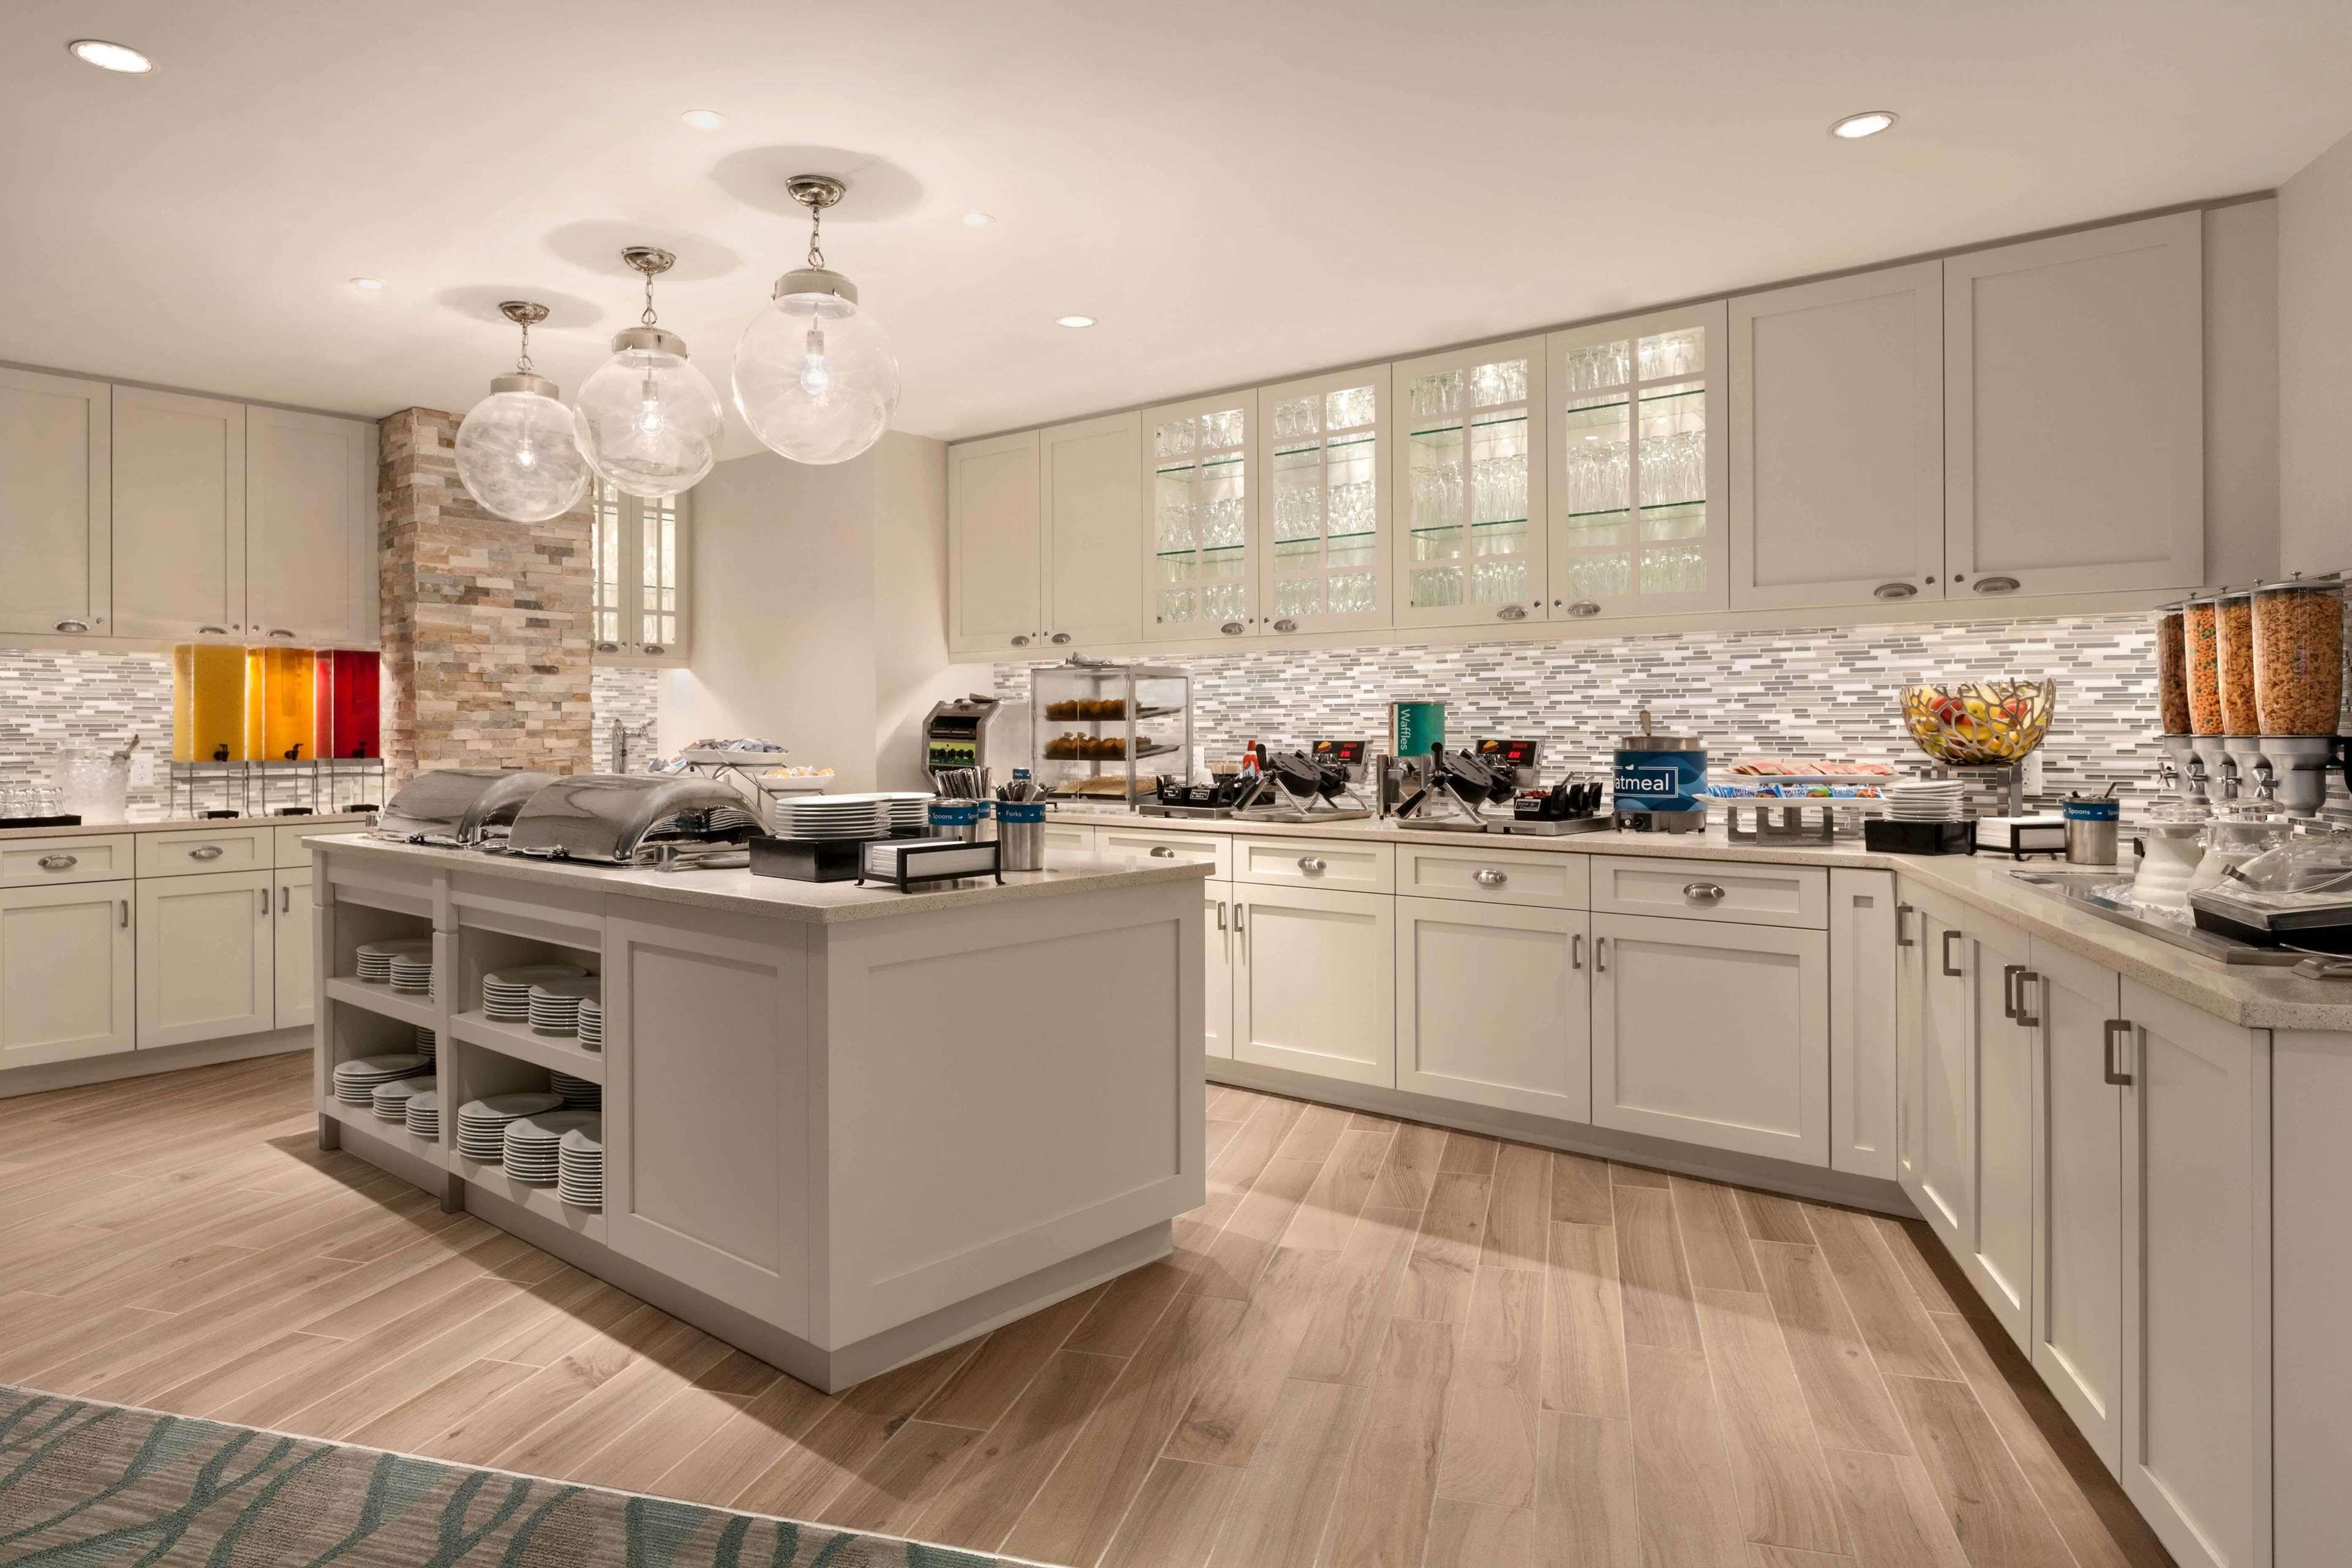 Homewood Suites by Hilton Washington DC Convention Center image 10